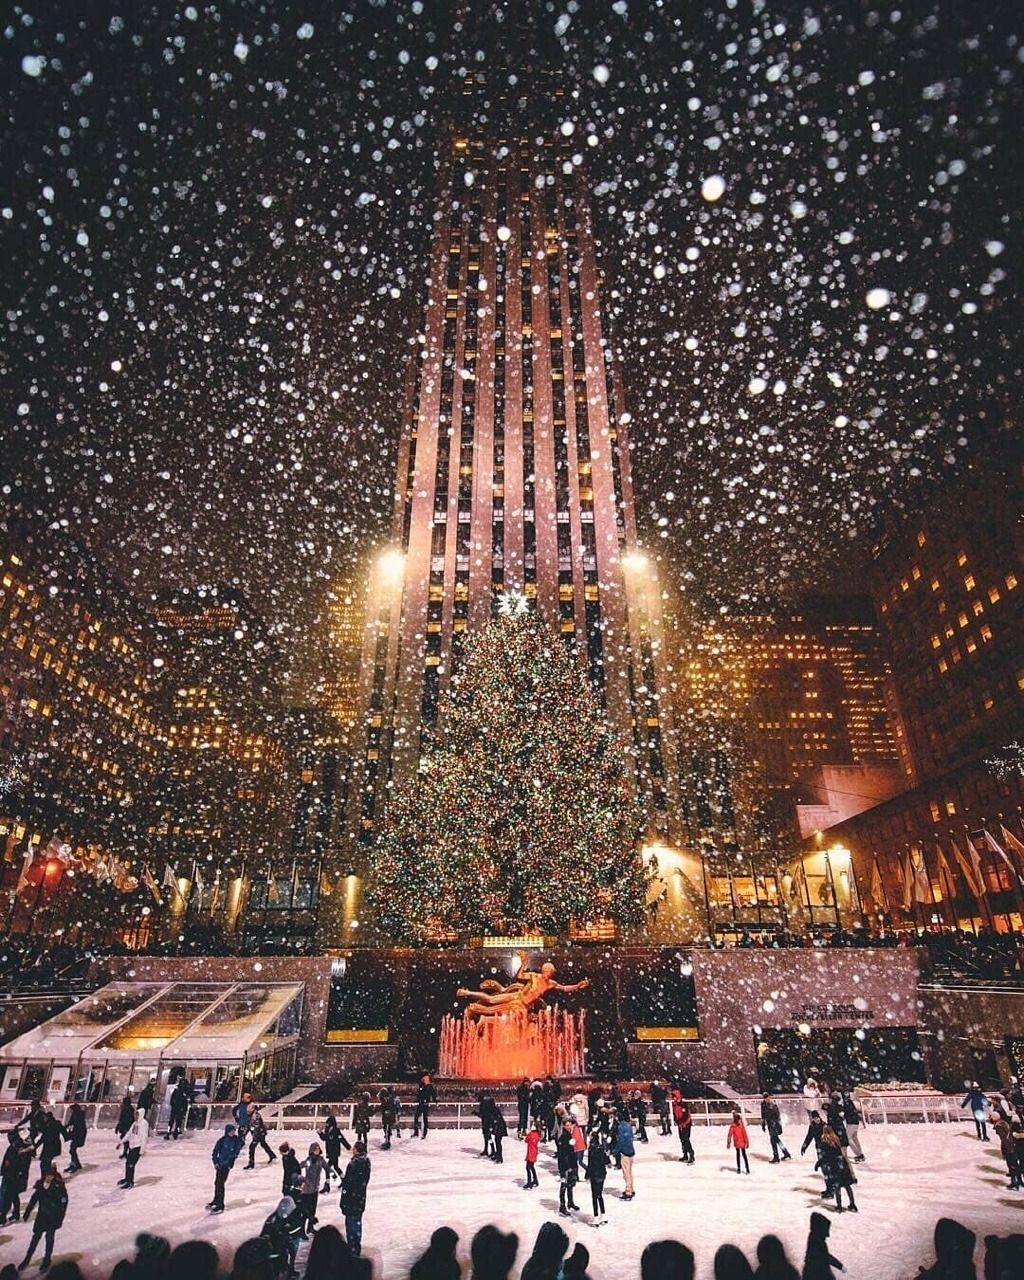 Rockefeller Center By Thewilliamanderson